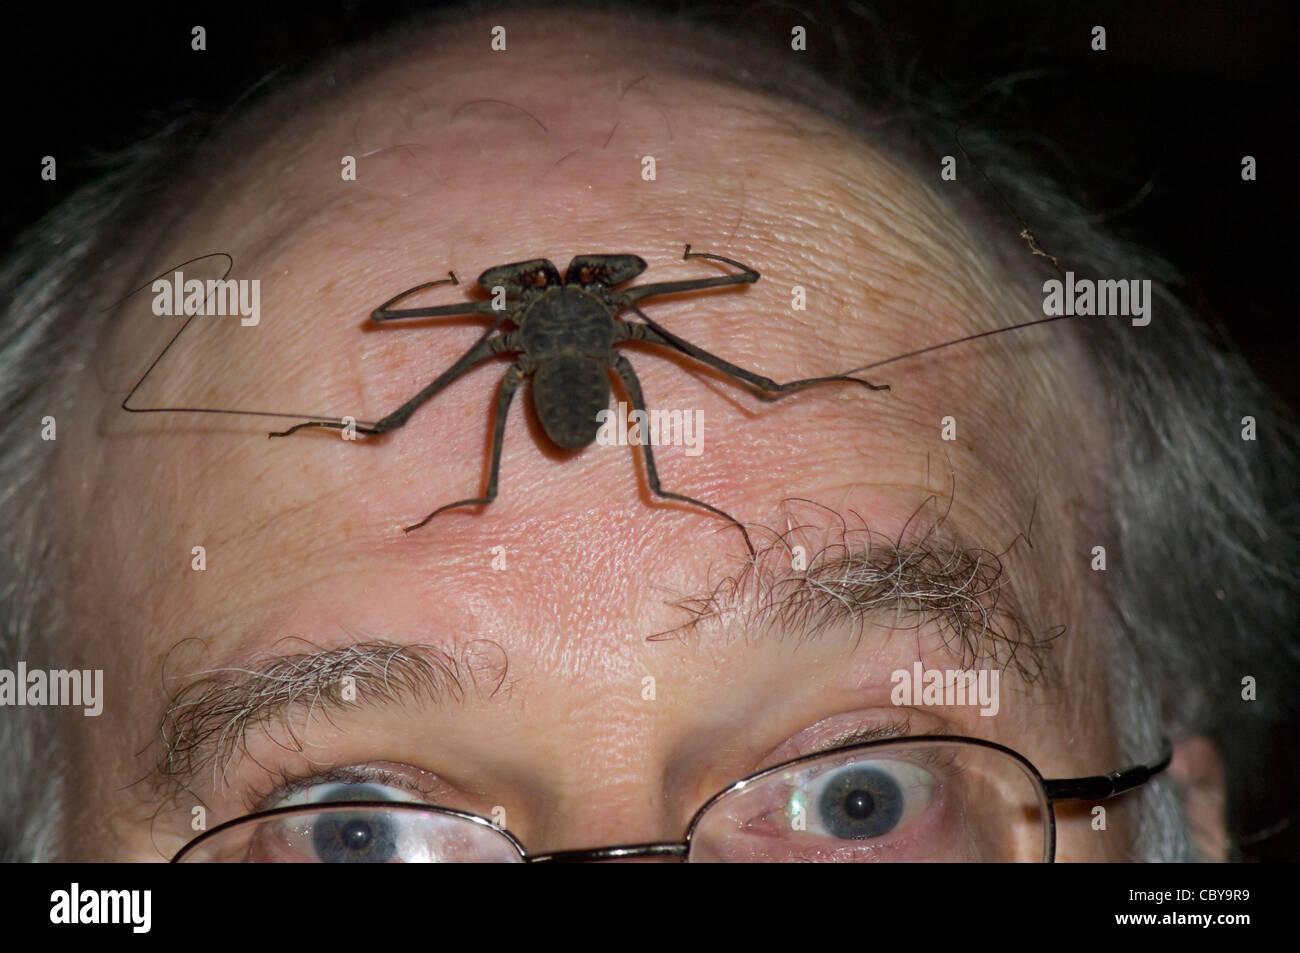 tailless-whipscorpion-paraphrynus-laevif